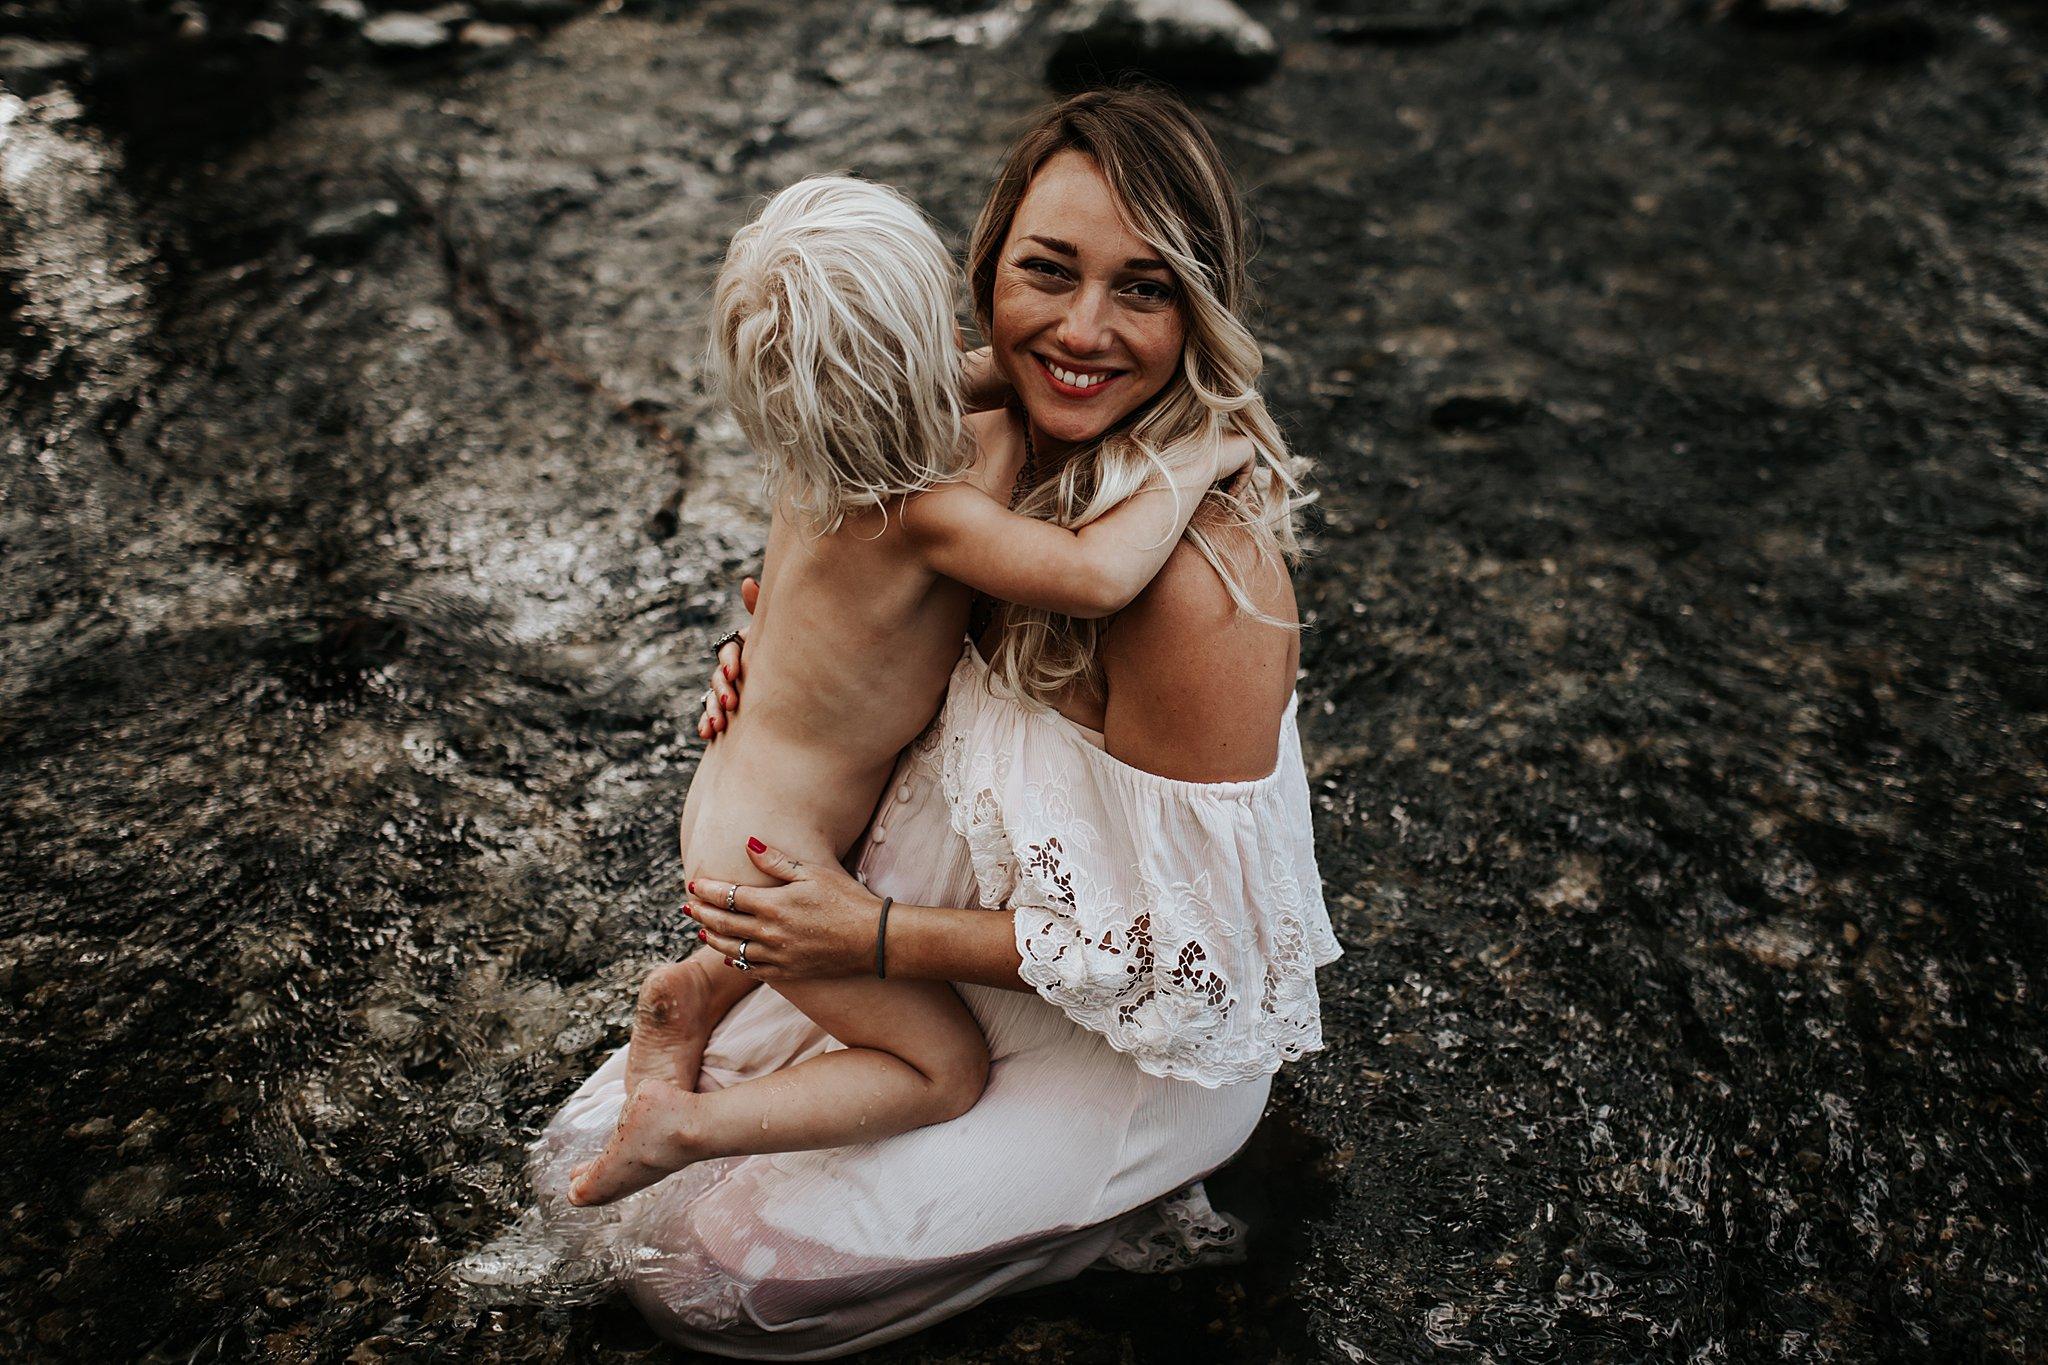 Shannon-San-Antonio-Maternity-Photographer-46_WEB.jpg